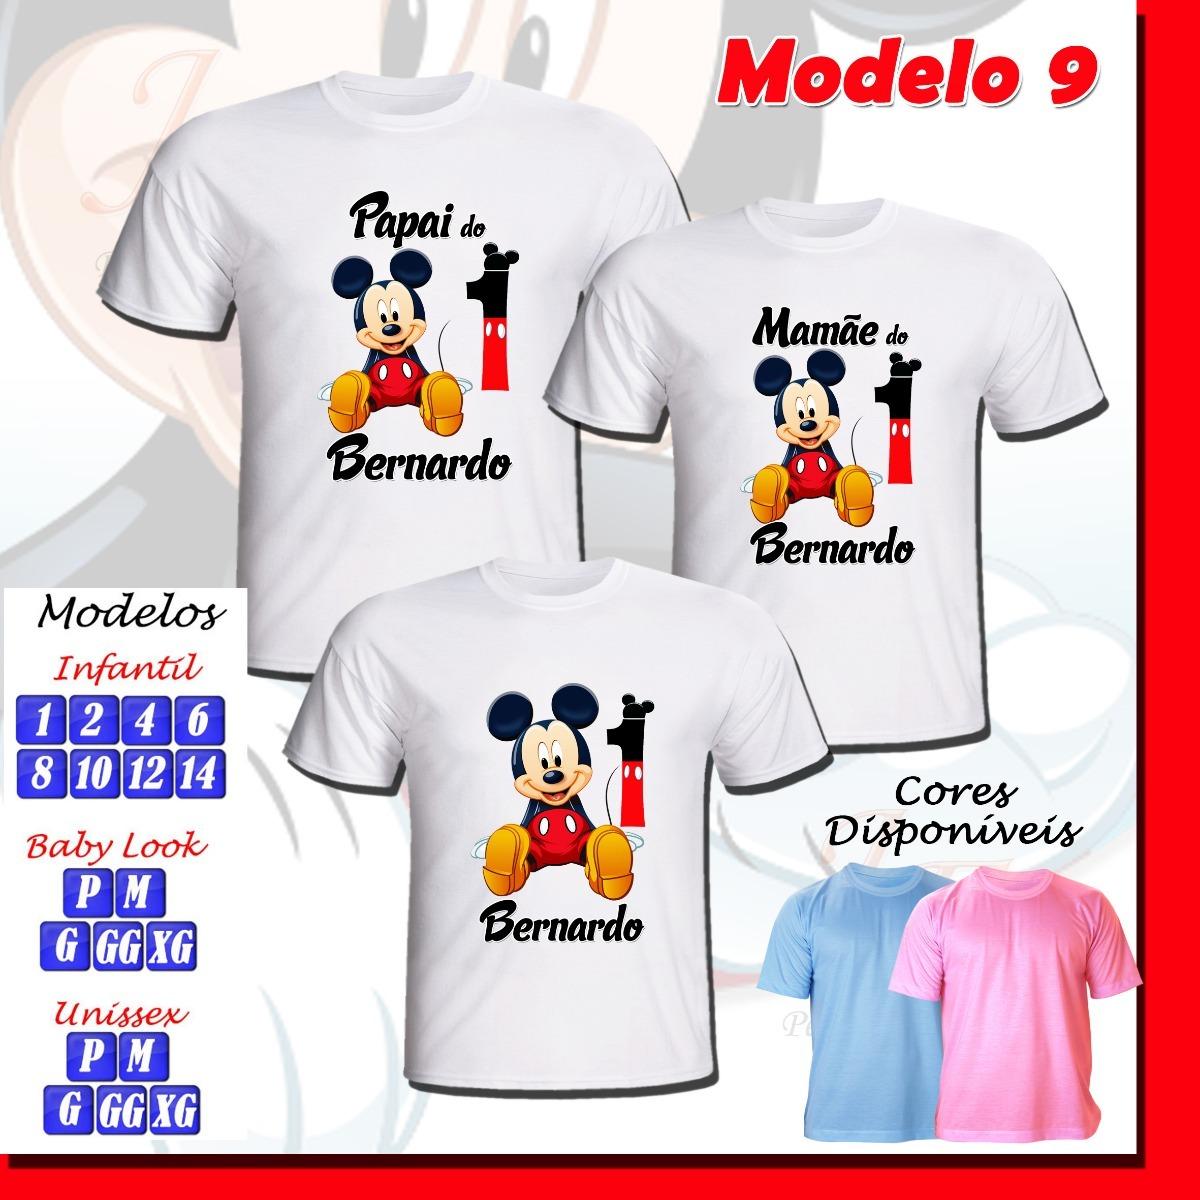 kit com 03 camisetas personalizadas infantil adulto mickey. Carregando zoom. f55c4b0ce36